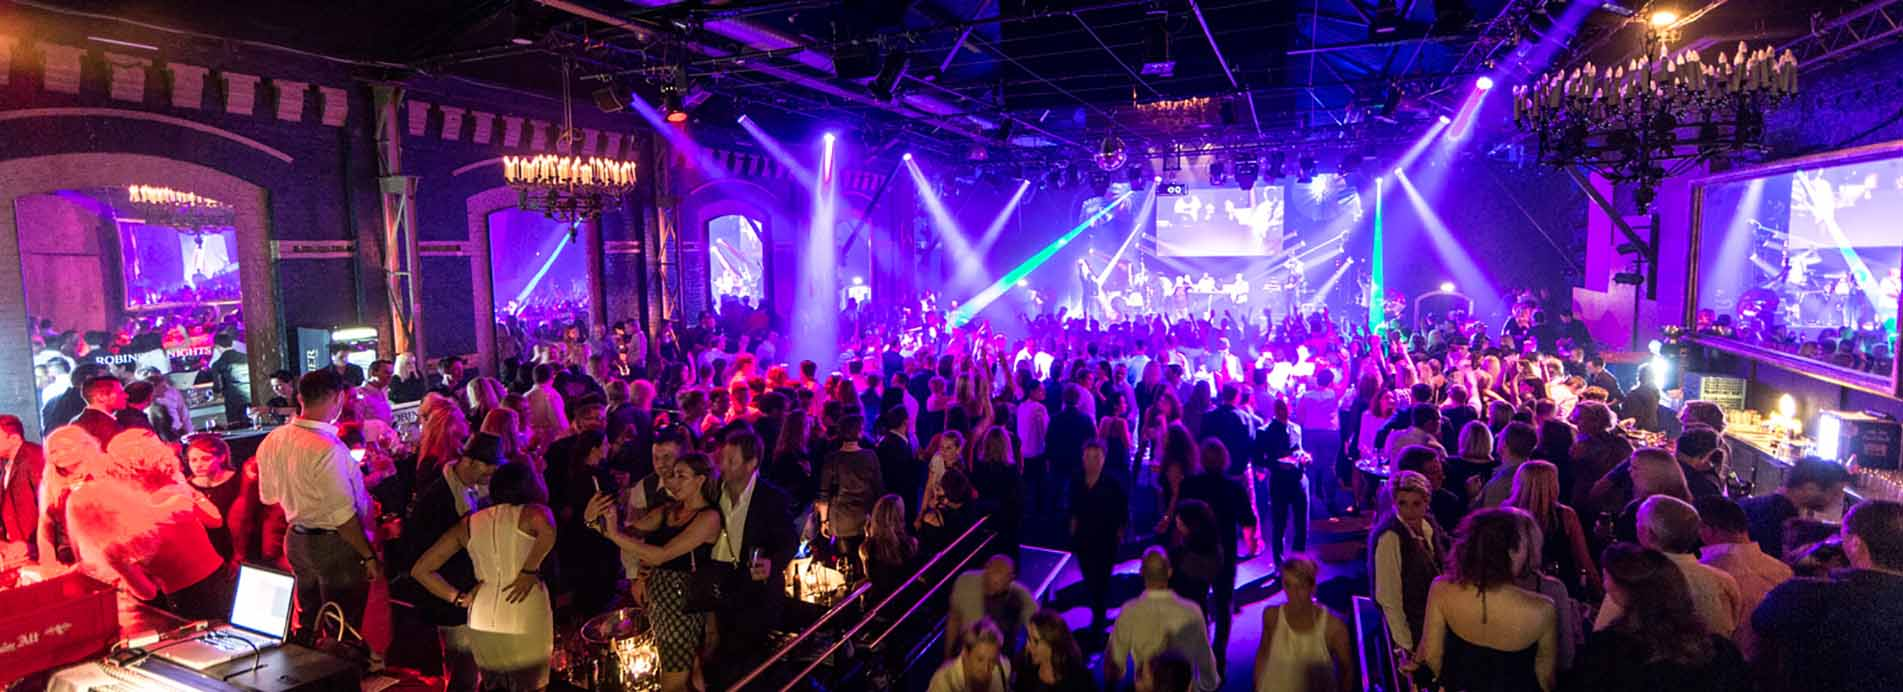 East Hotel Hamburg Party